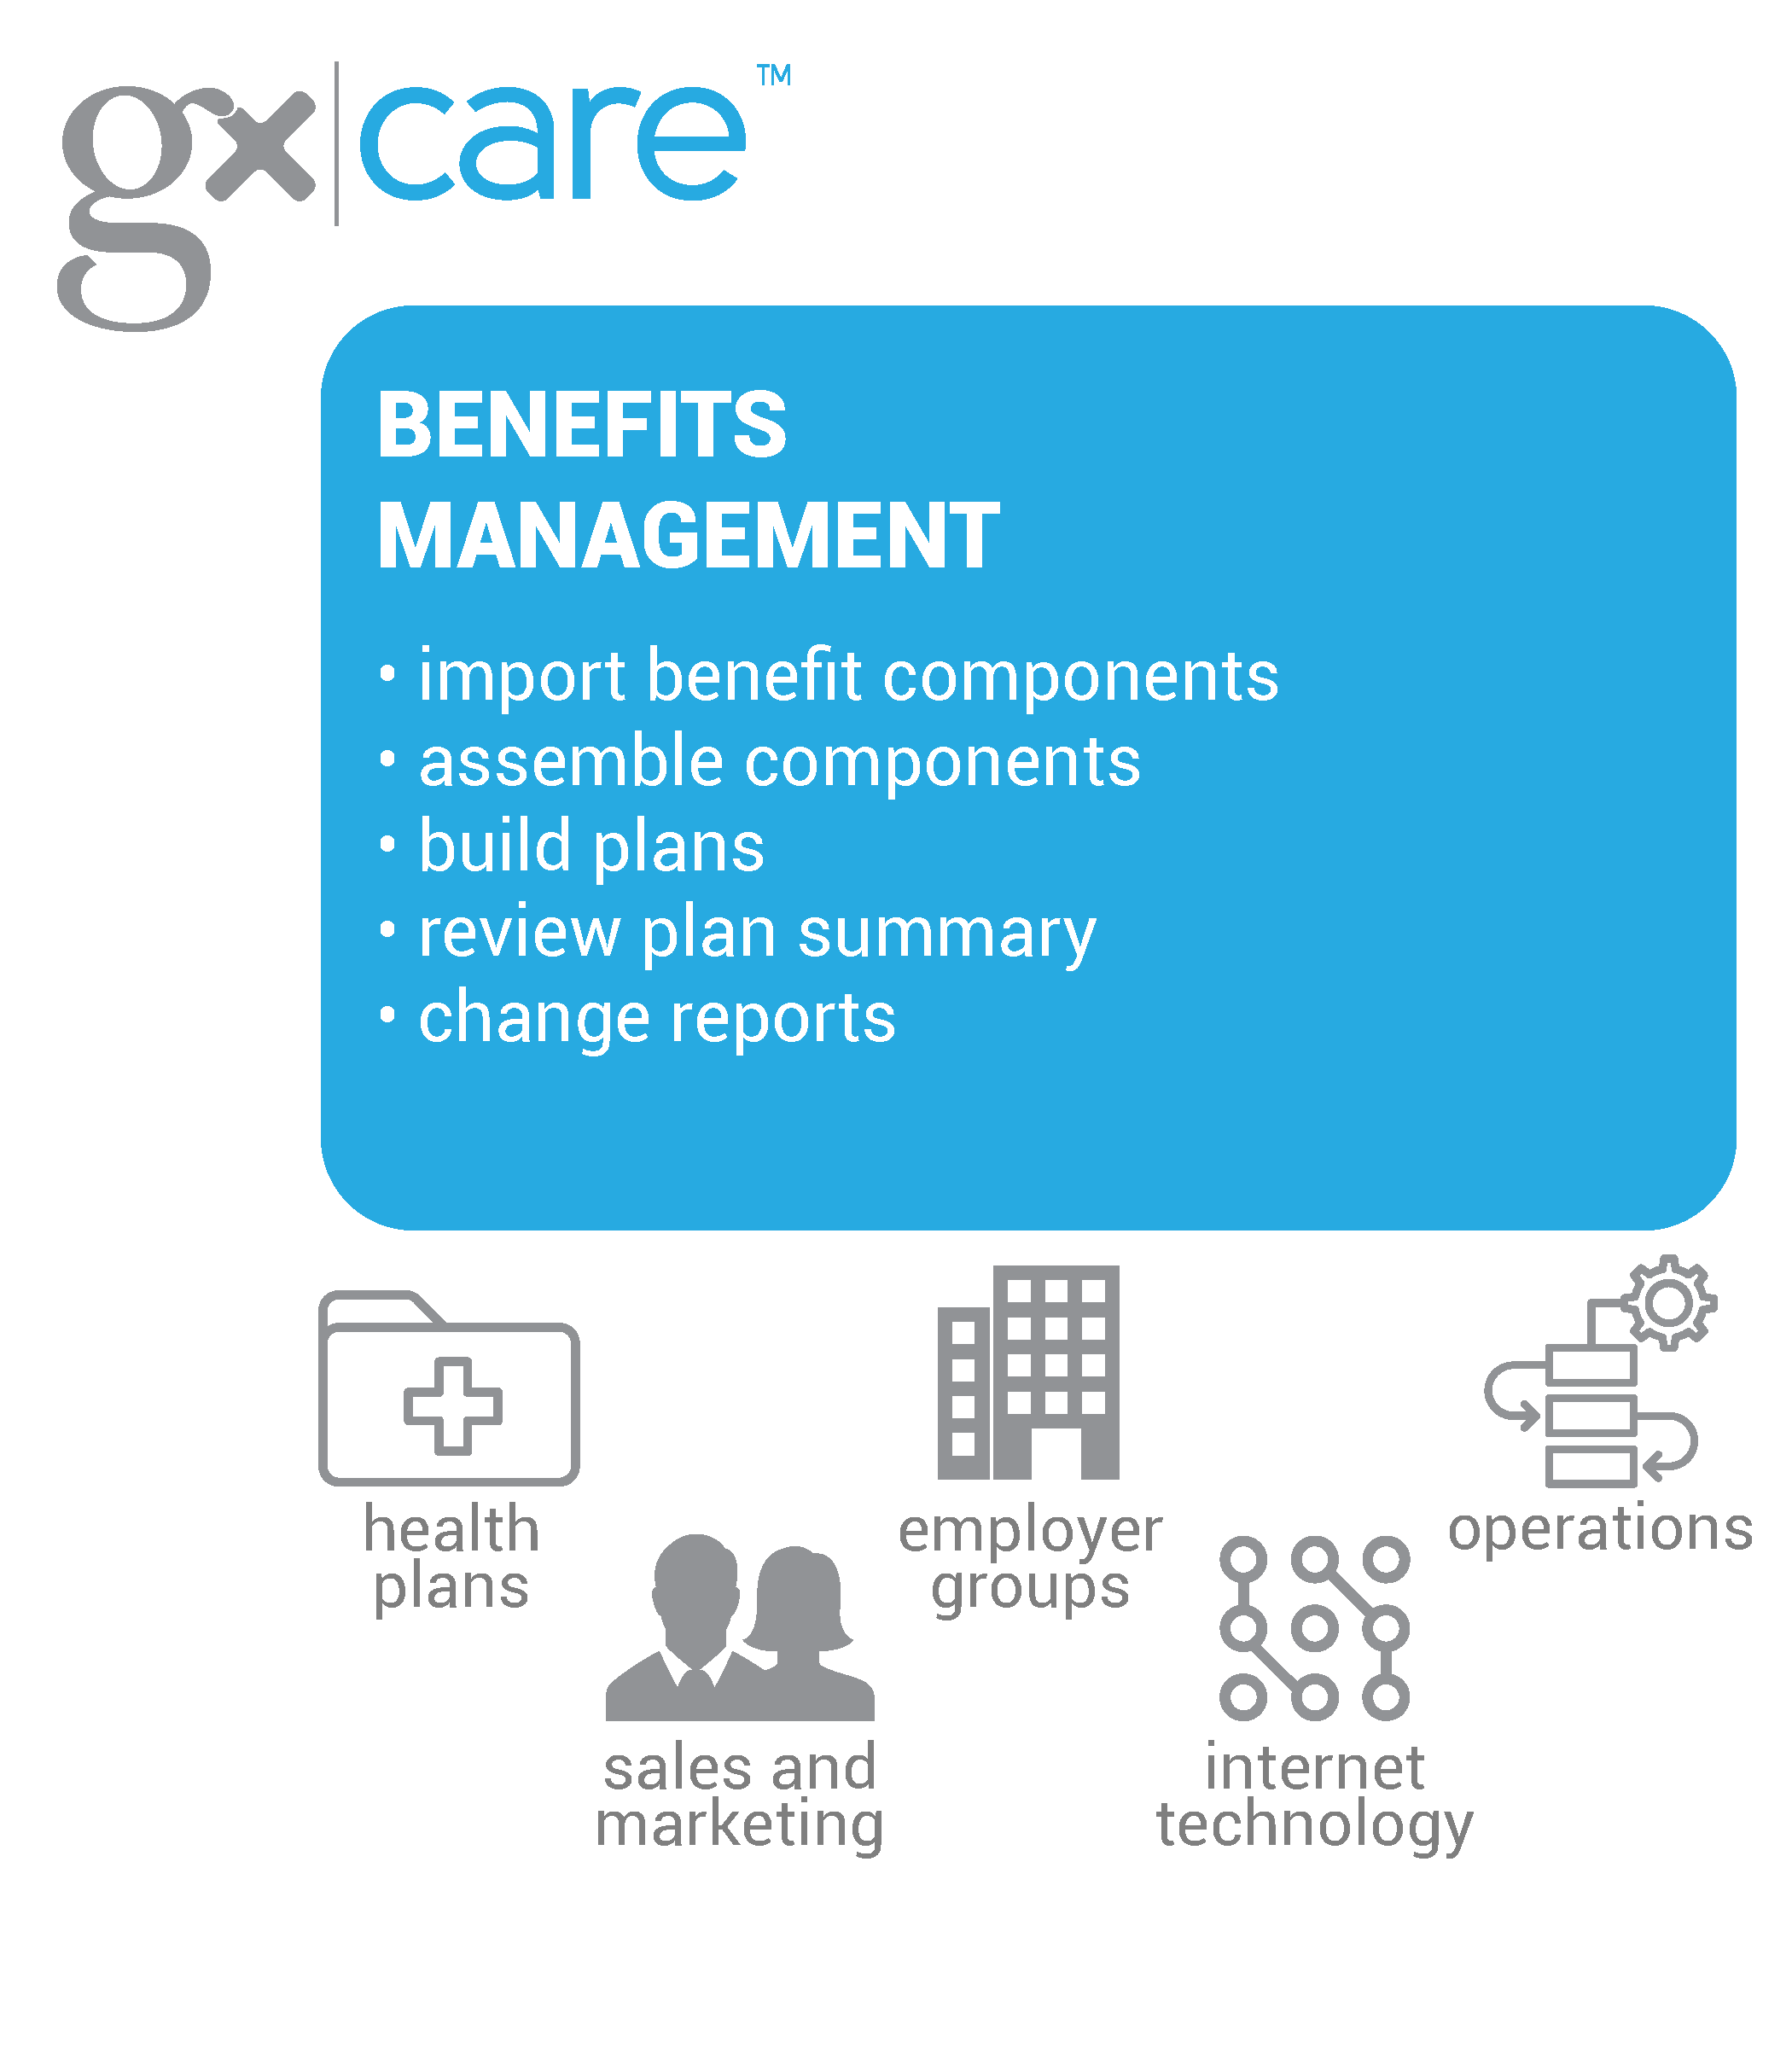 GxCare Diagram